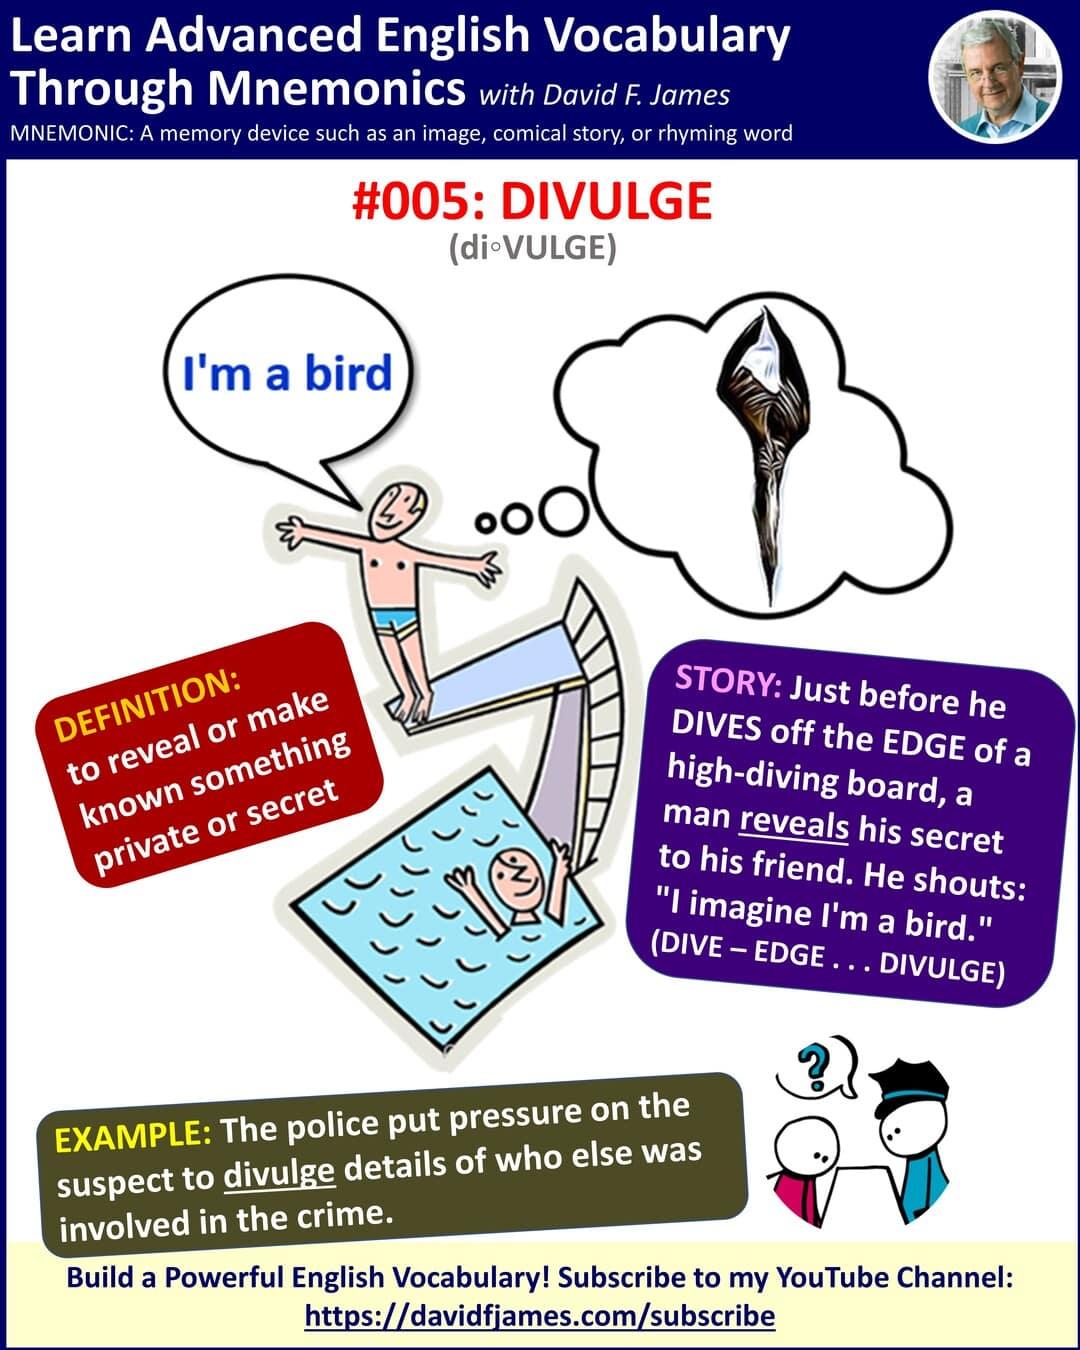 definition of divulge - divulge in a sentence